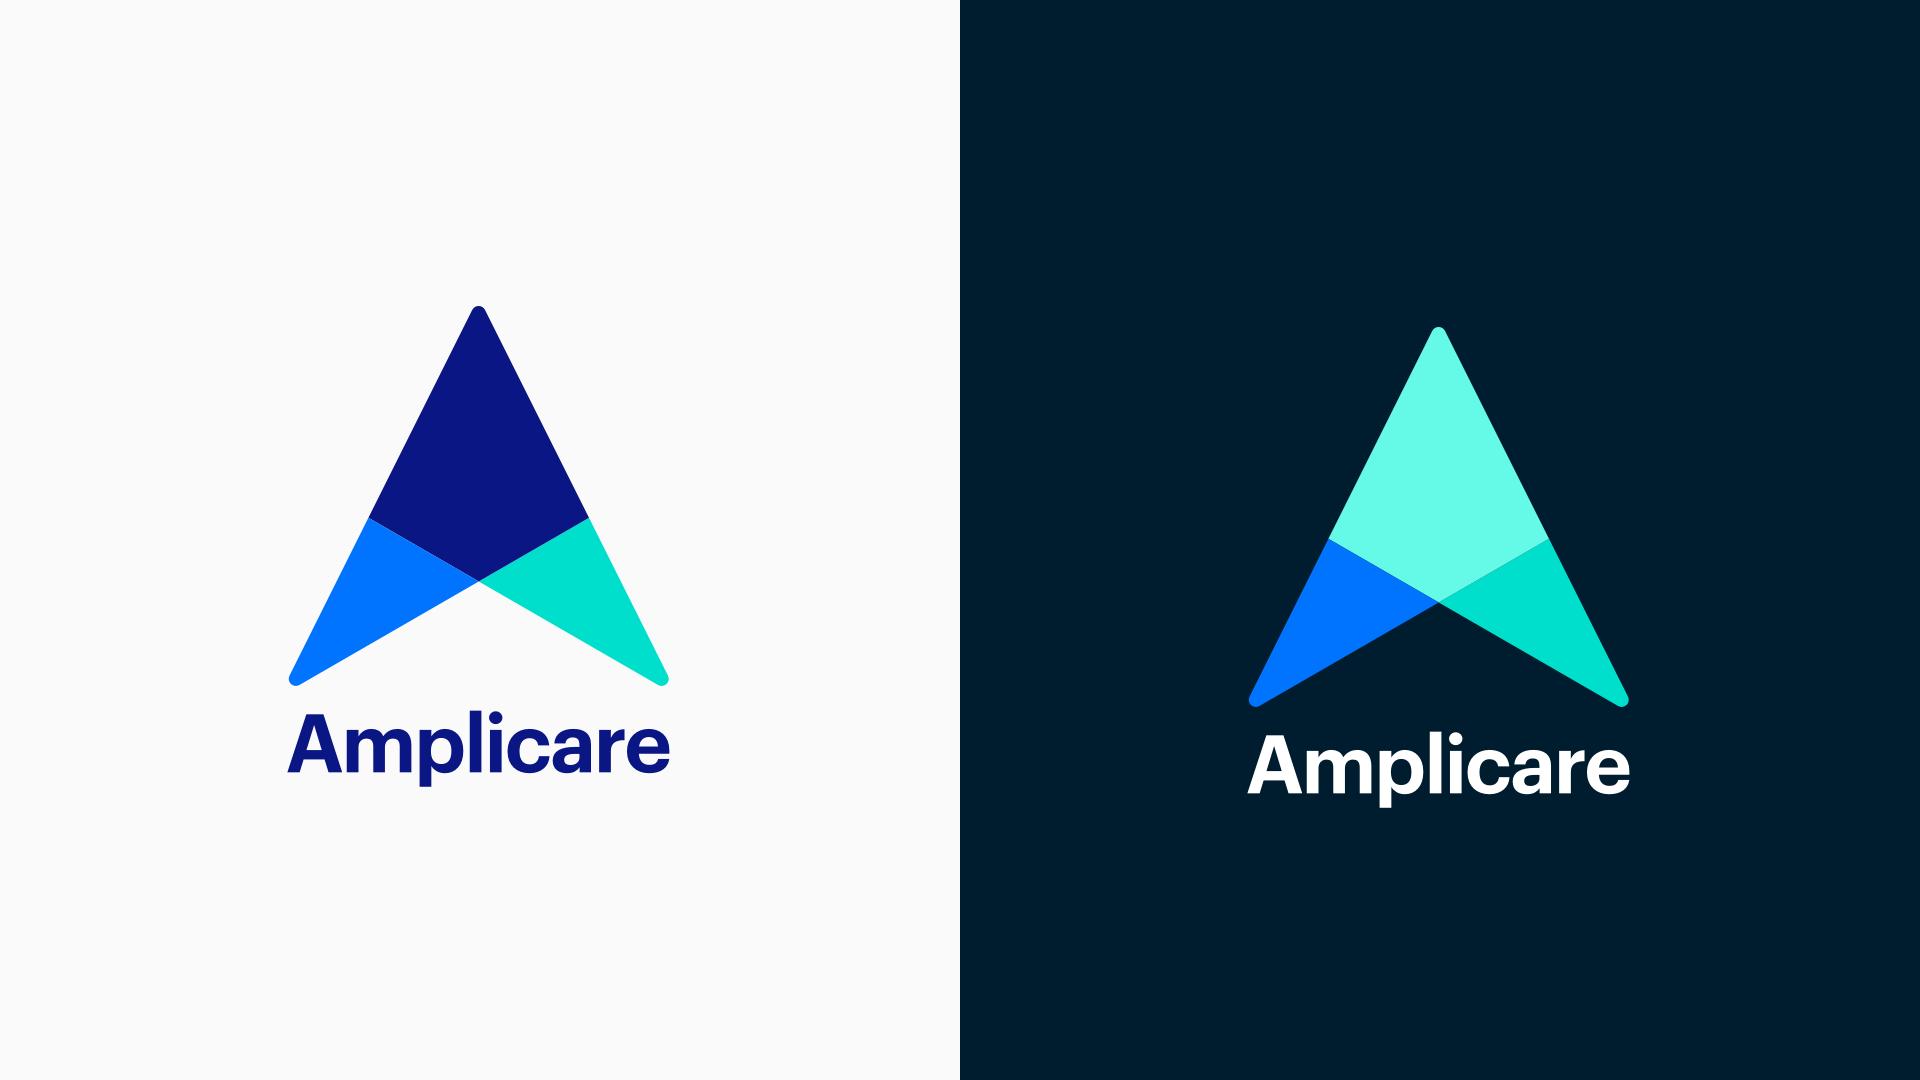 Logo Amplicare variants 1.png